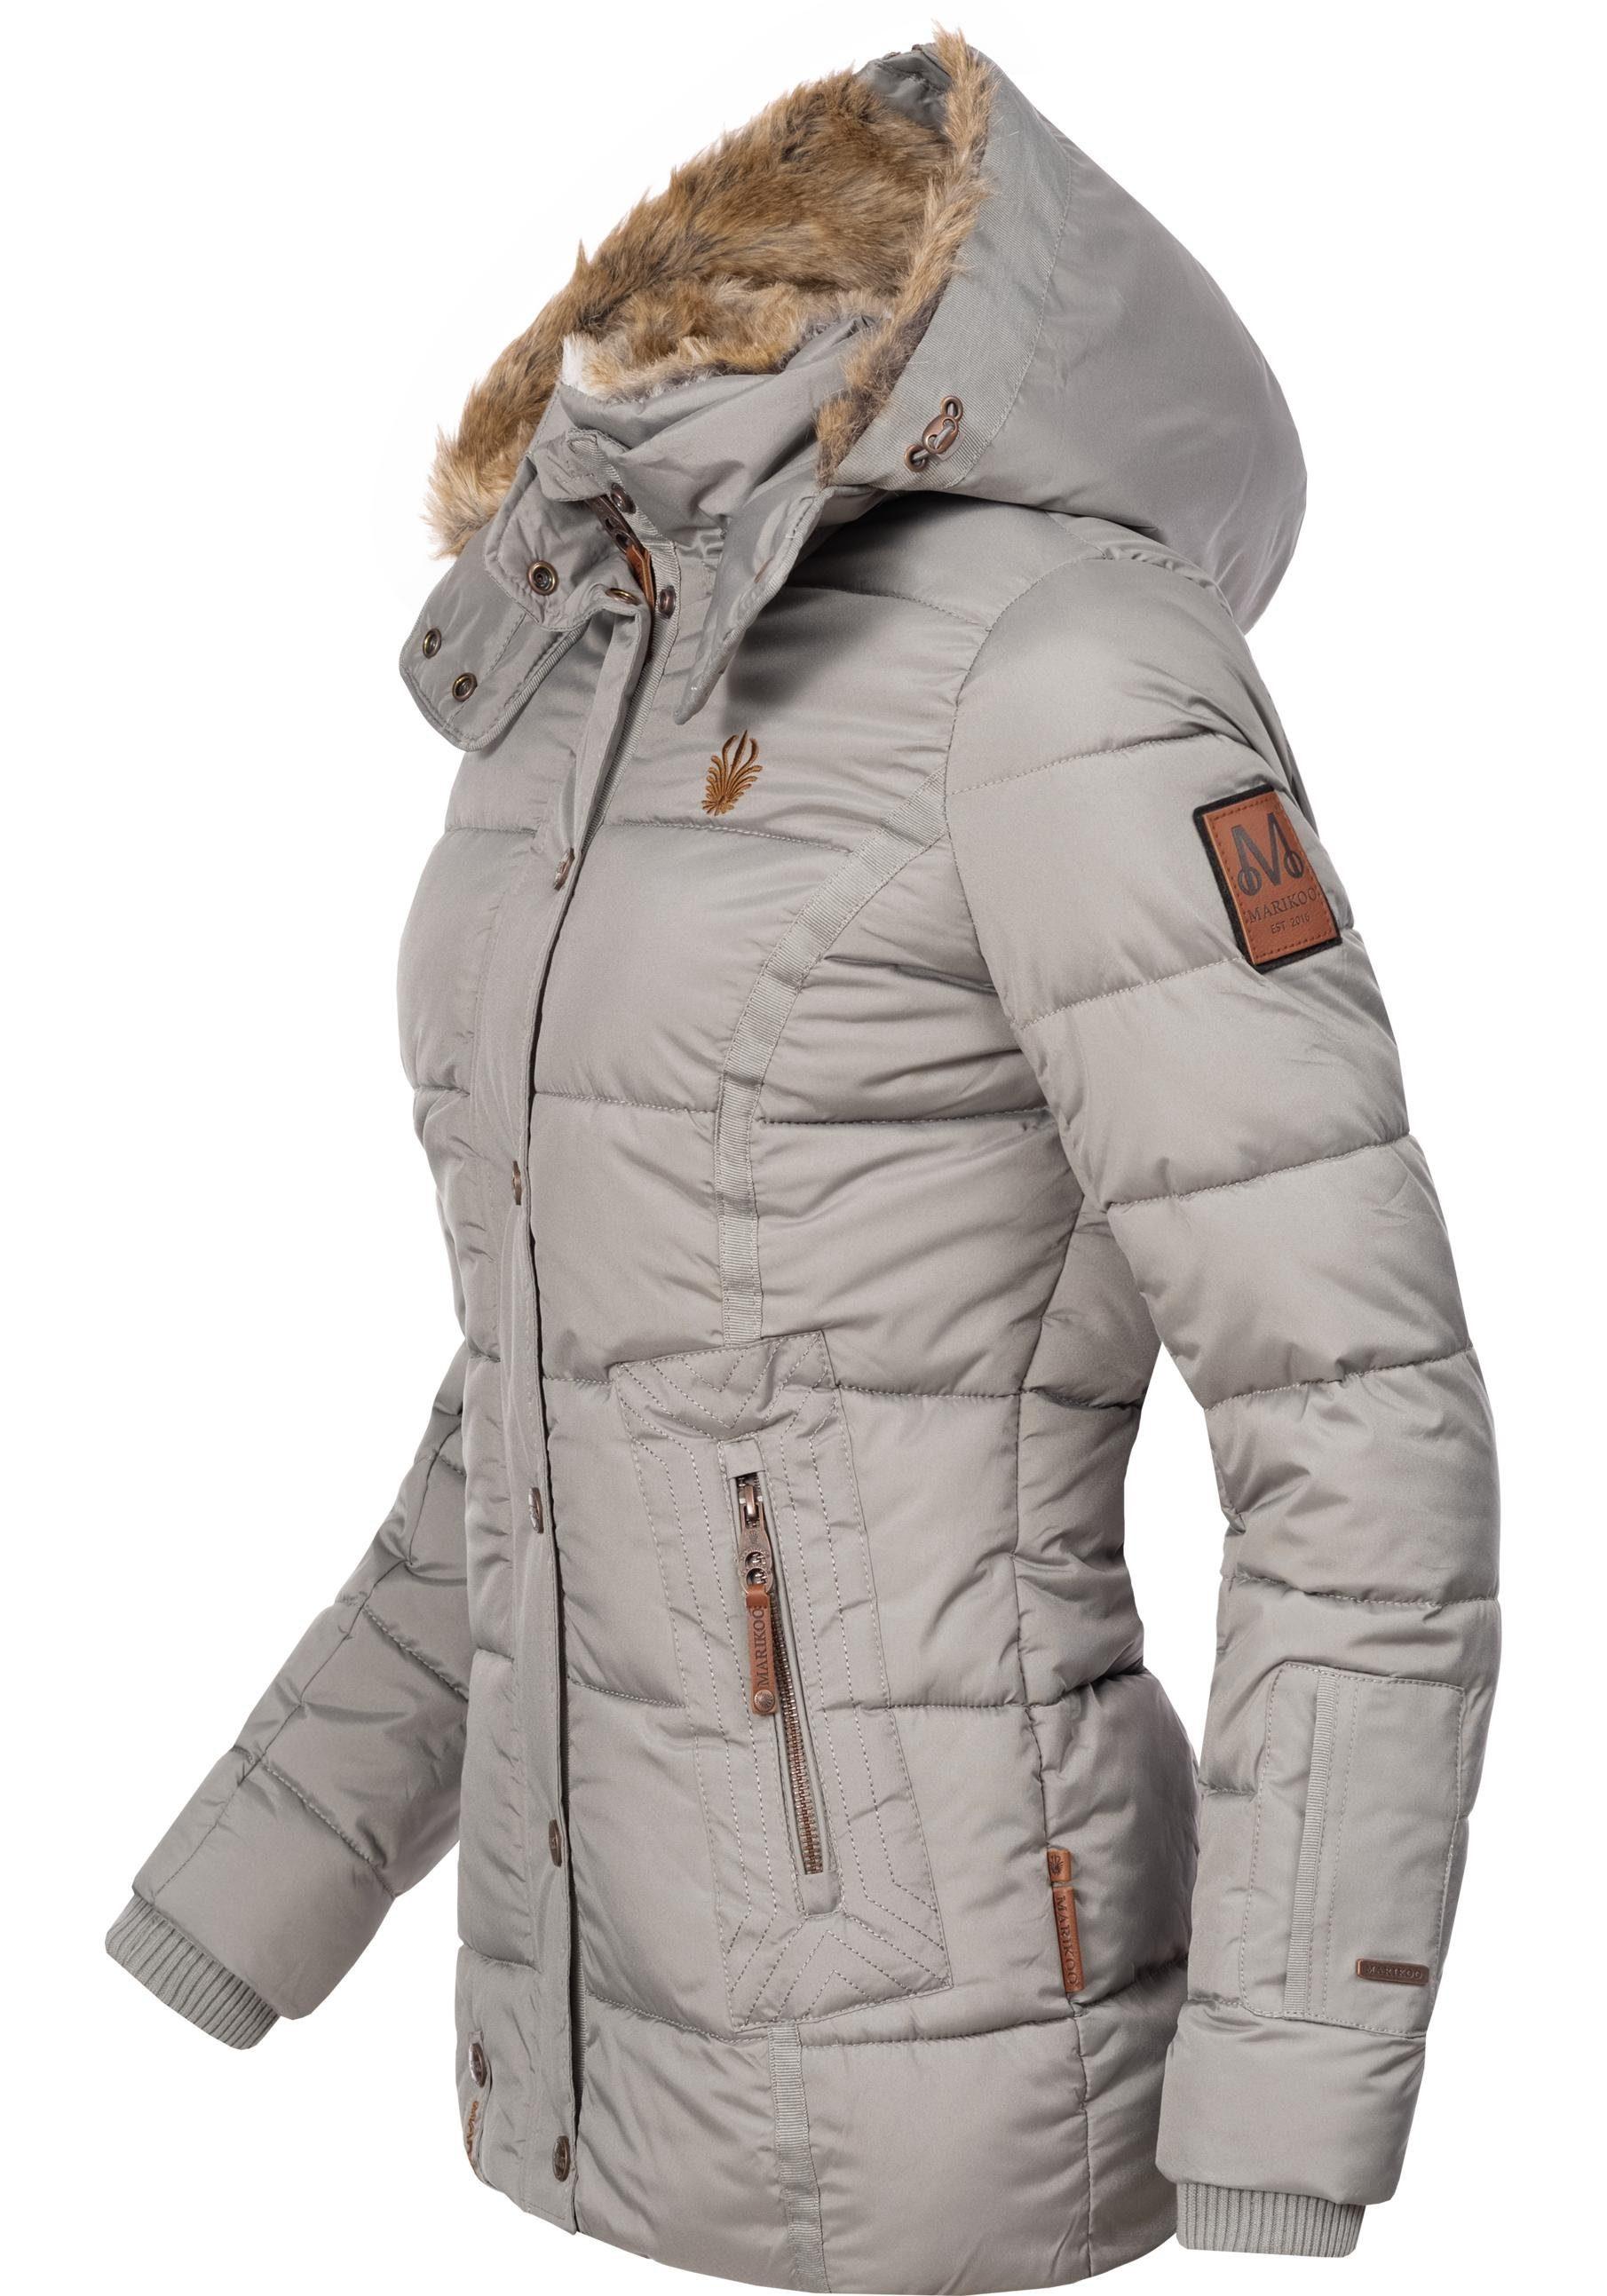 Großer Kapuze Mit Steppjacke Damen Online KaufenOtto Marikoo Stylische Winterjacke »nekoo« q3Ac54LRj